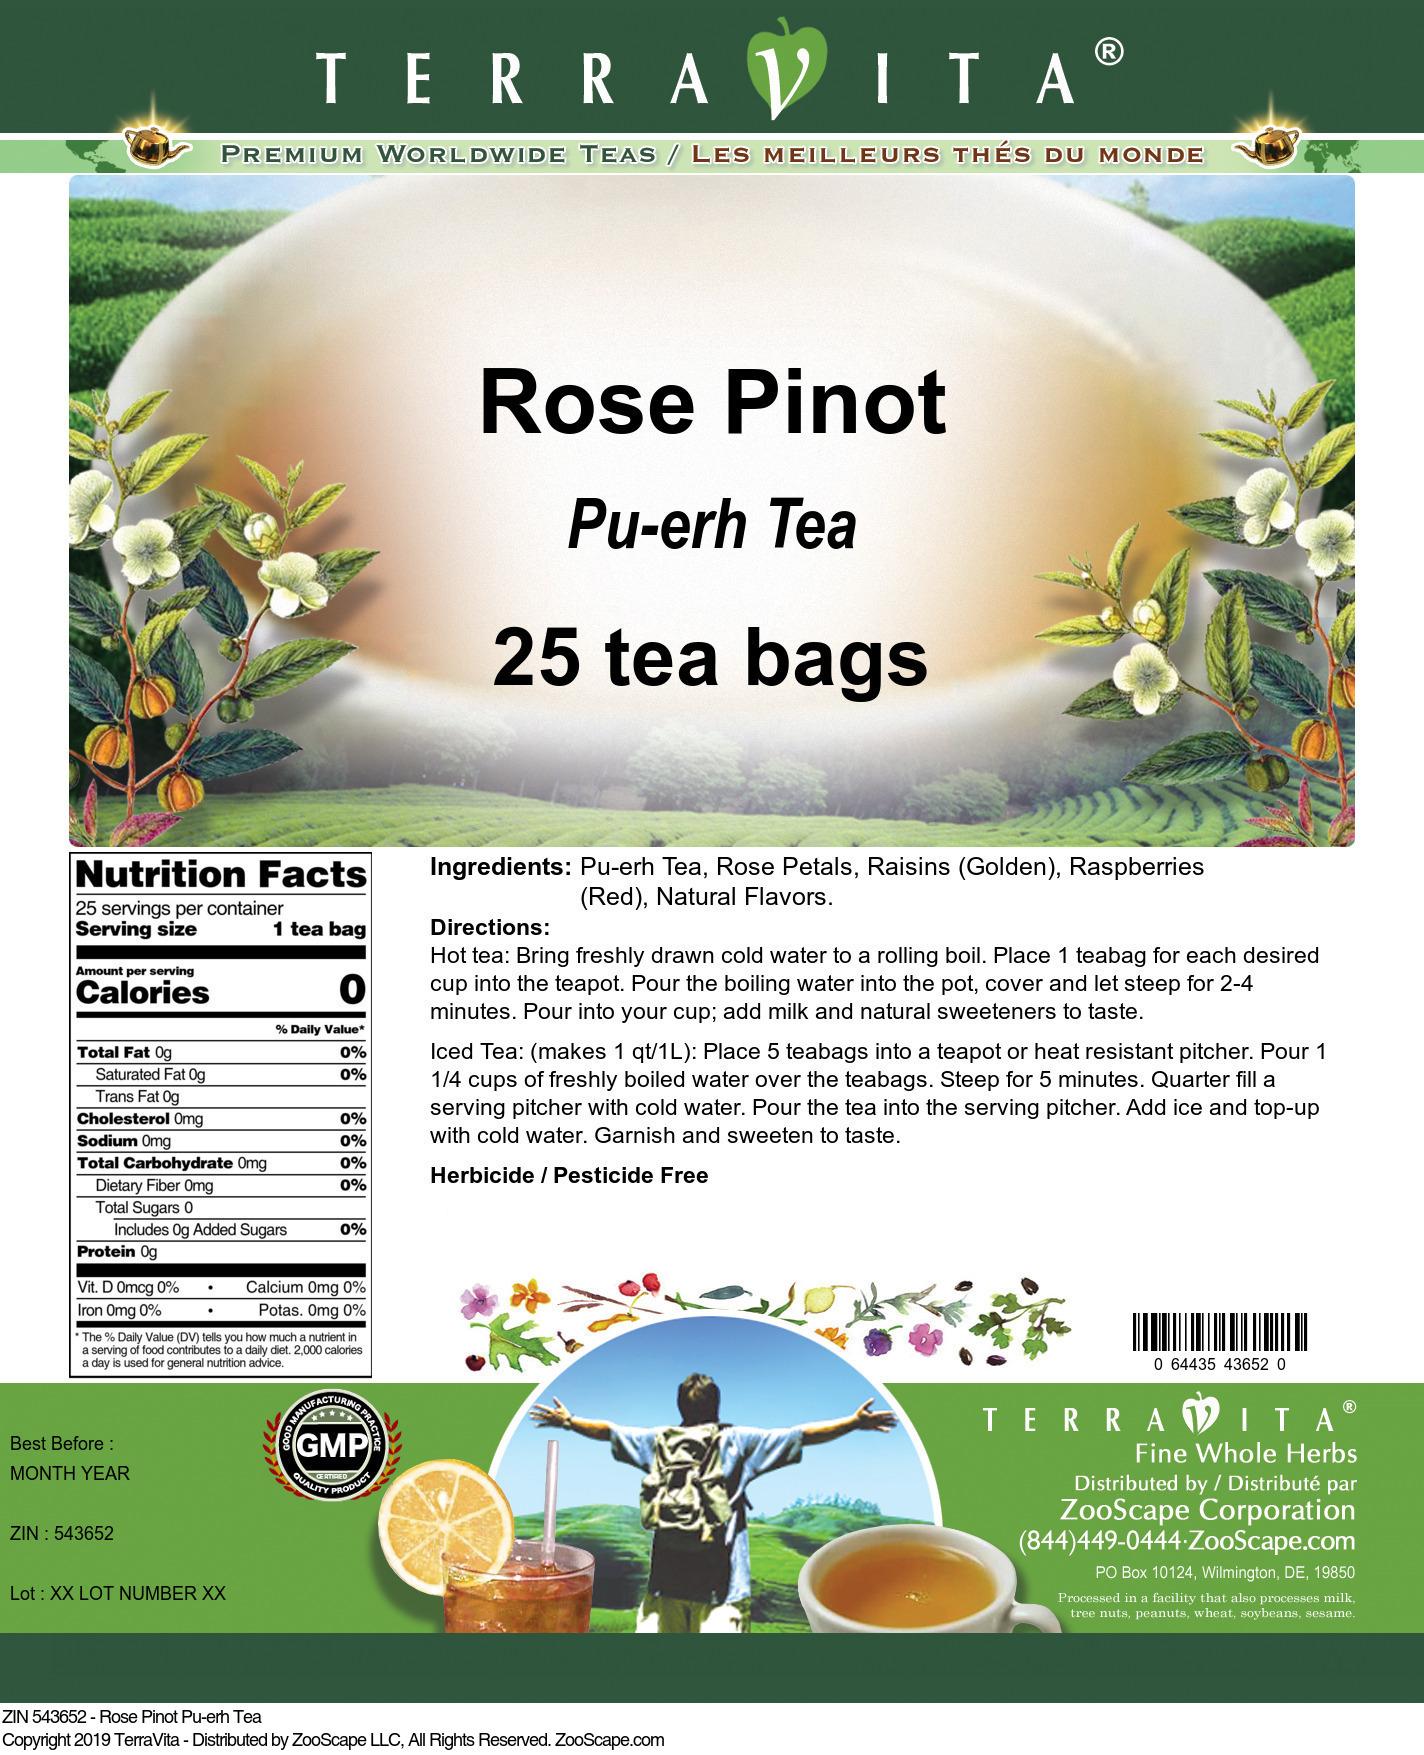 Rose Pinot Pu-erh Tea